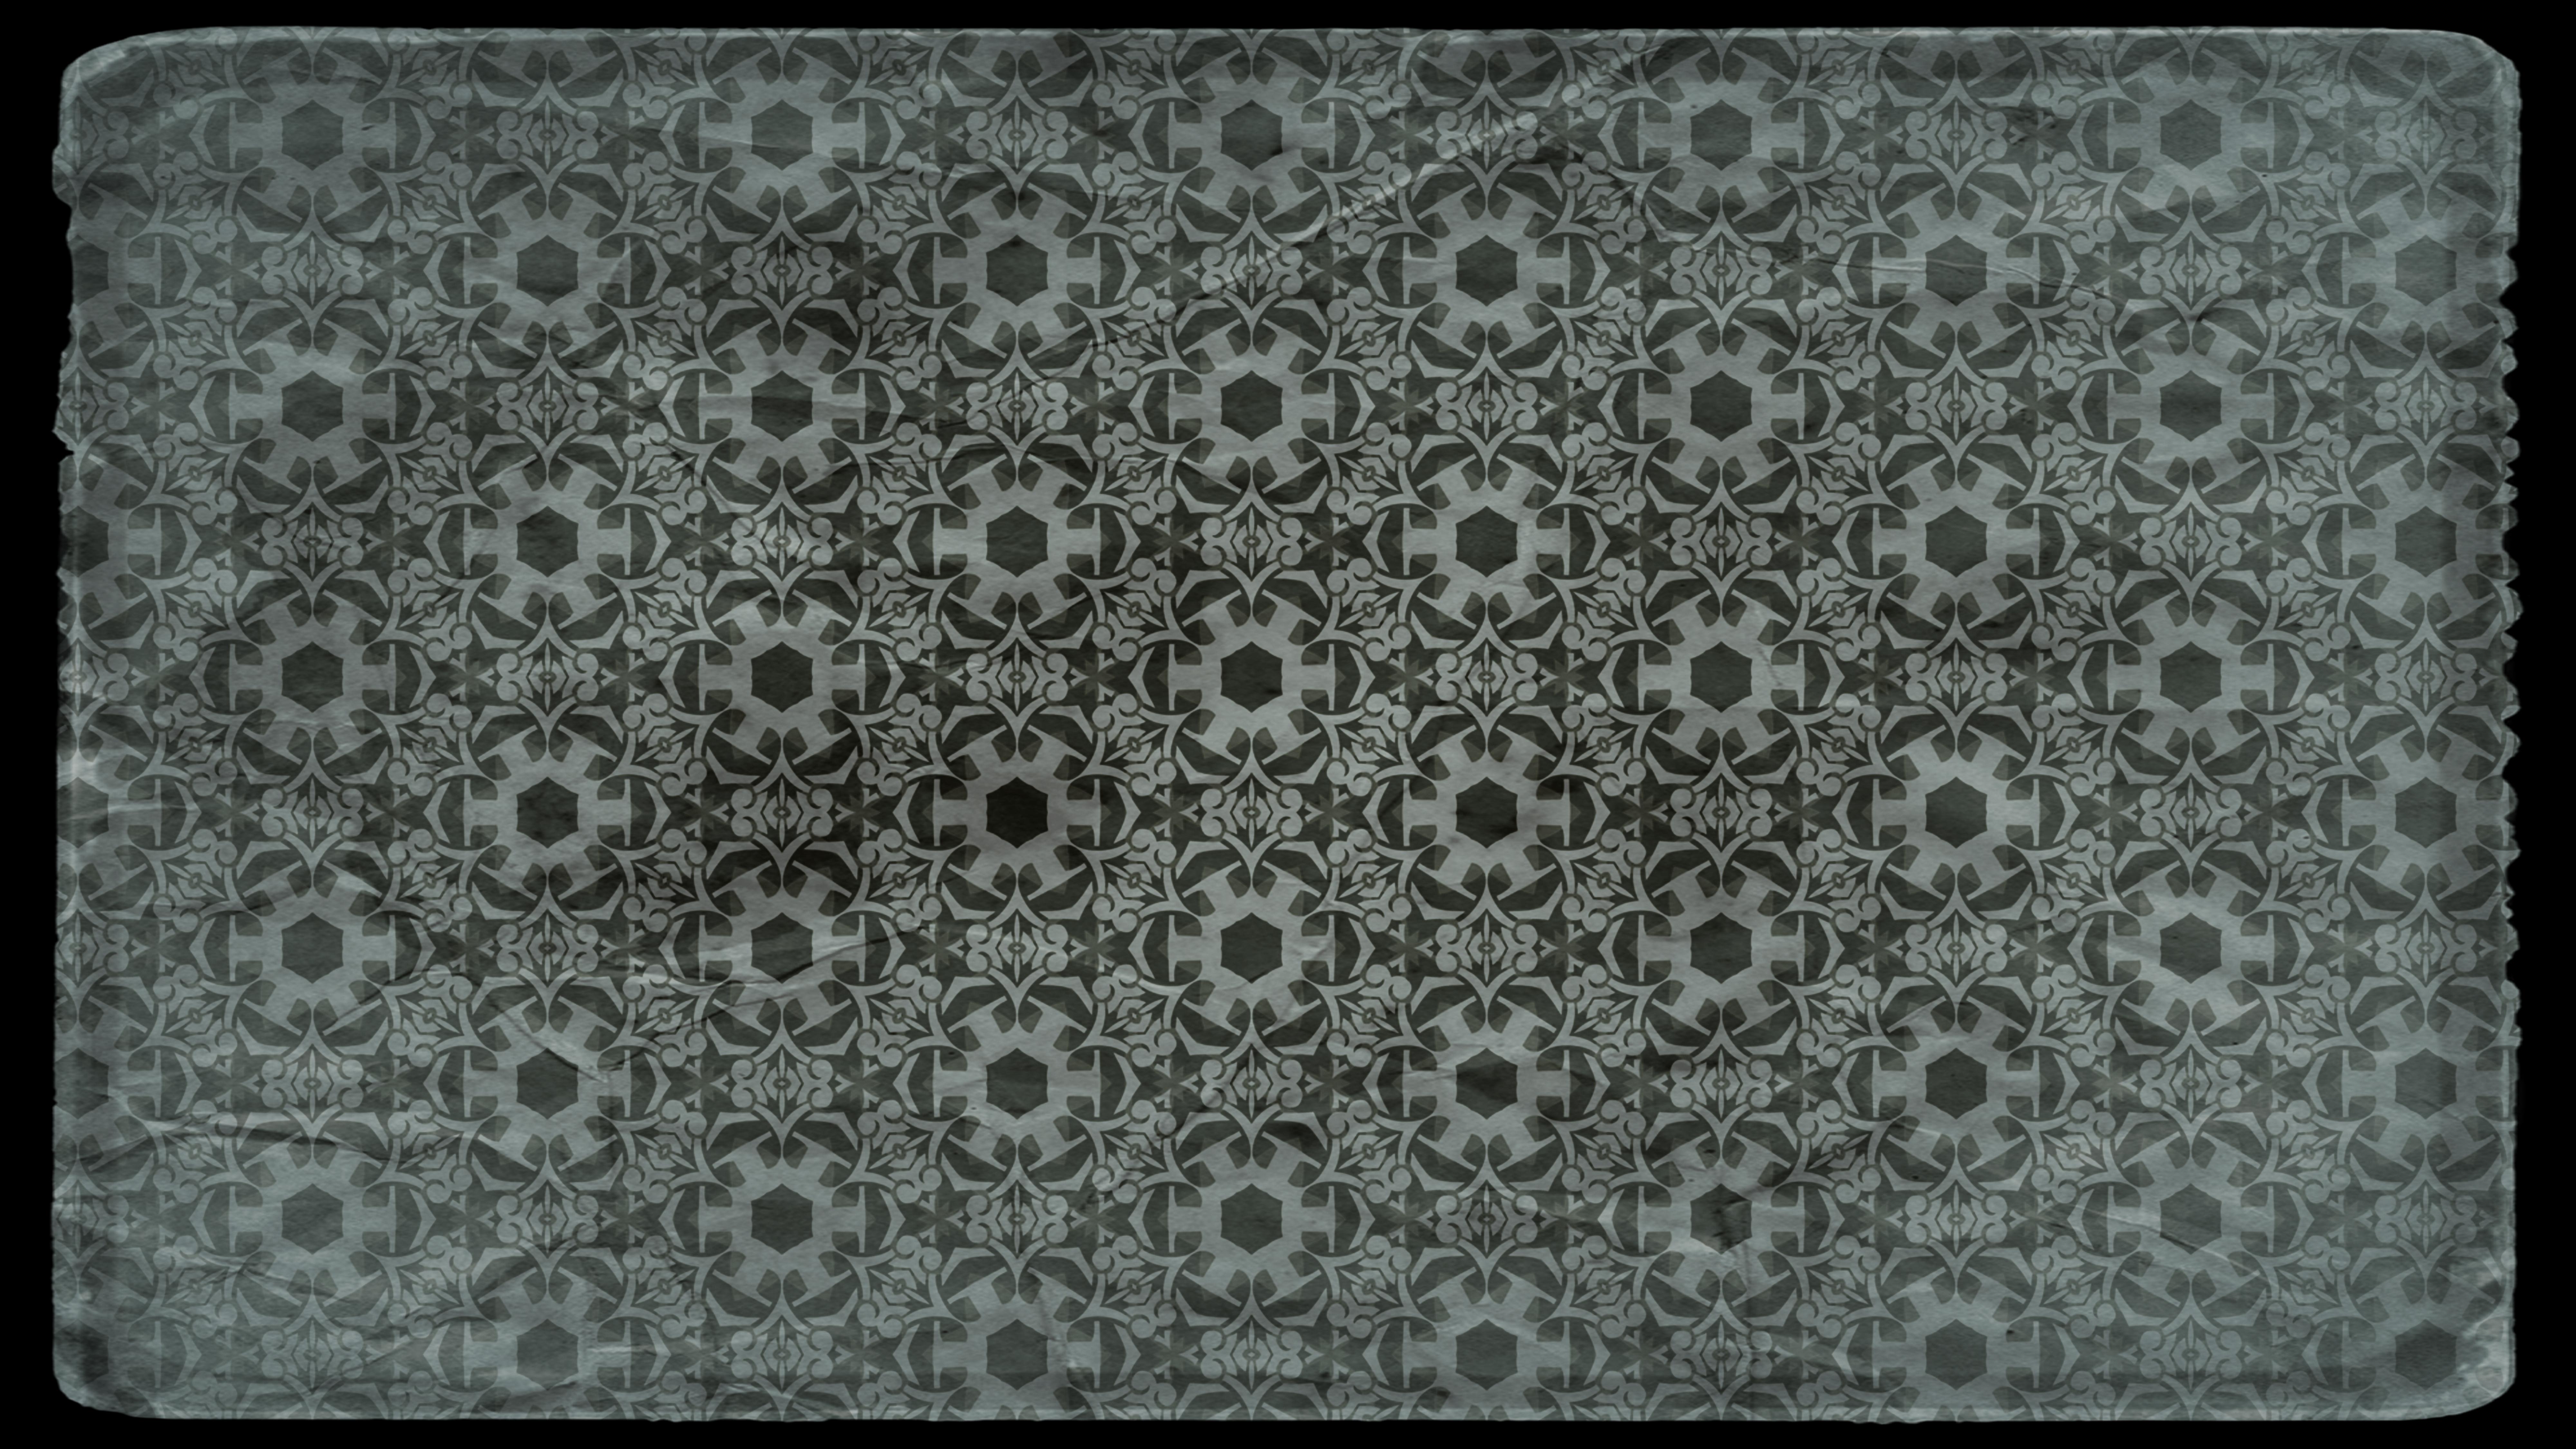 Dark Color Vintage Seamless Wallpaper Background - Wallpaper - HD Wallpaper